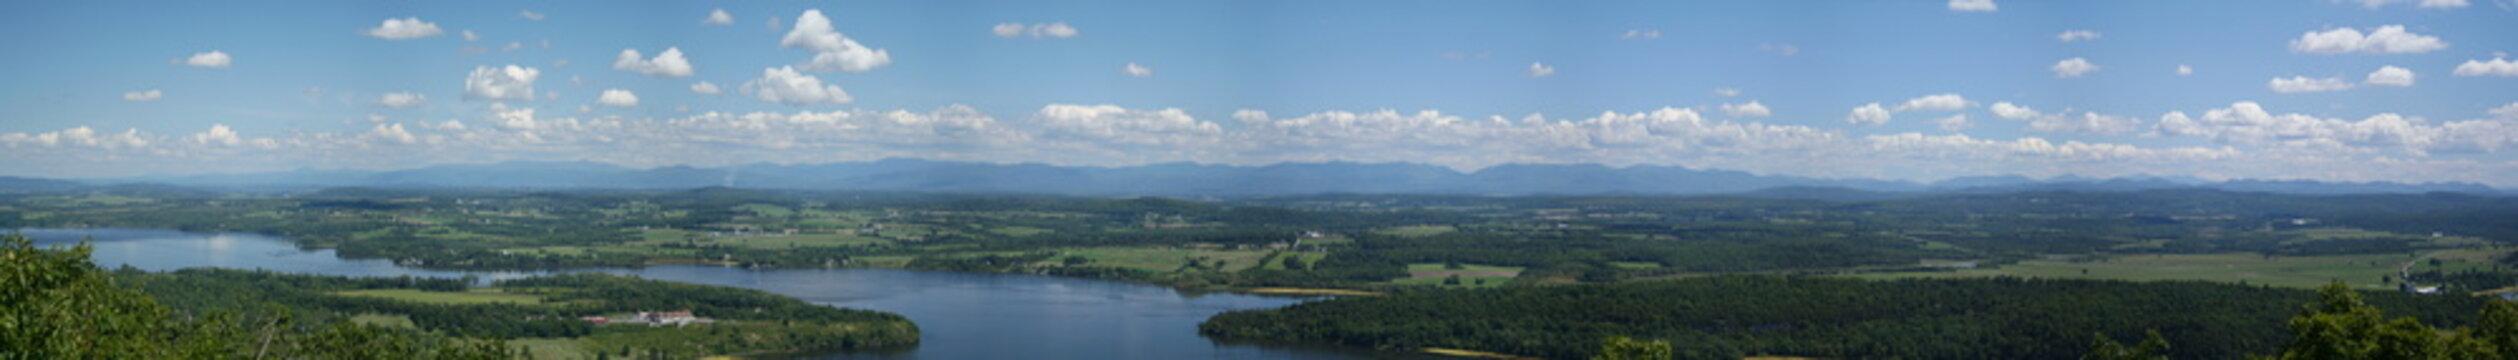 Panoramic View of Adirondack Mountains